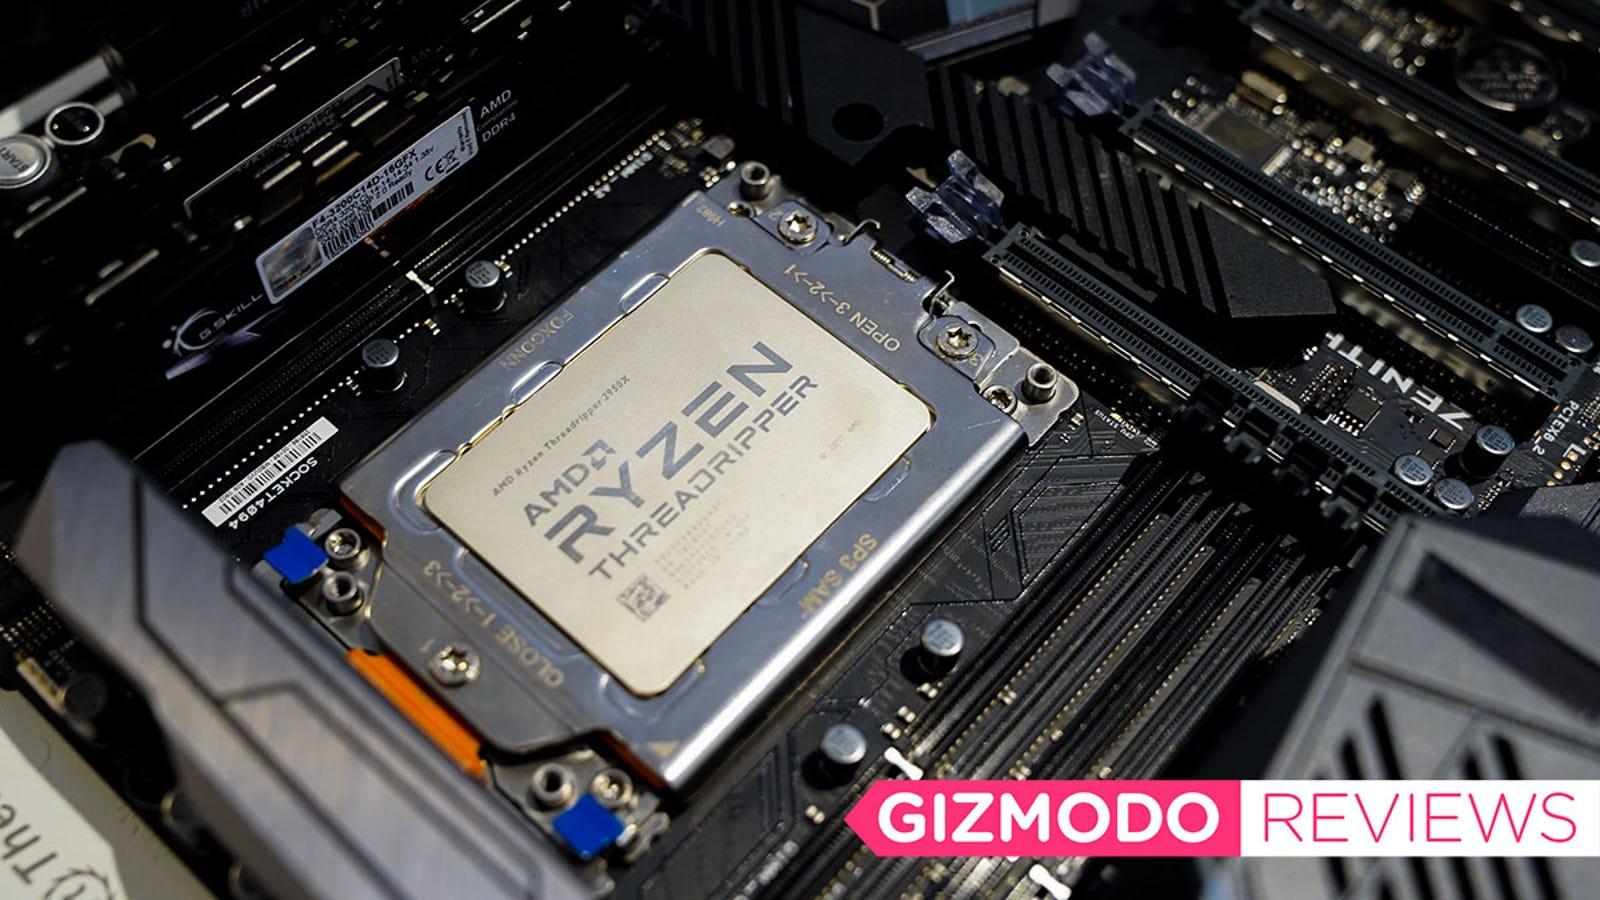 AMD Ryzen Threadripper 2950X Review: It's Faster Than Intel